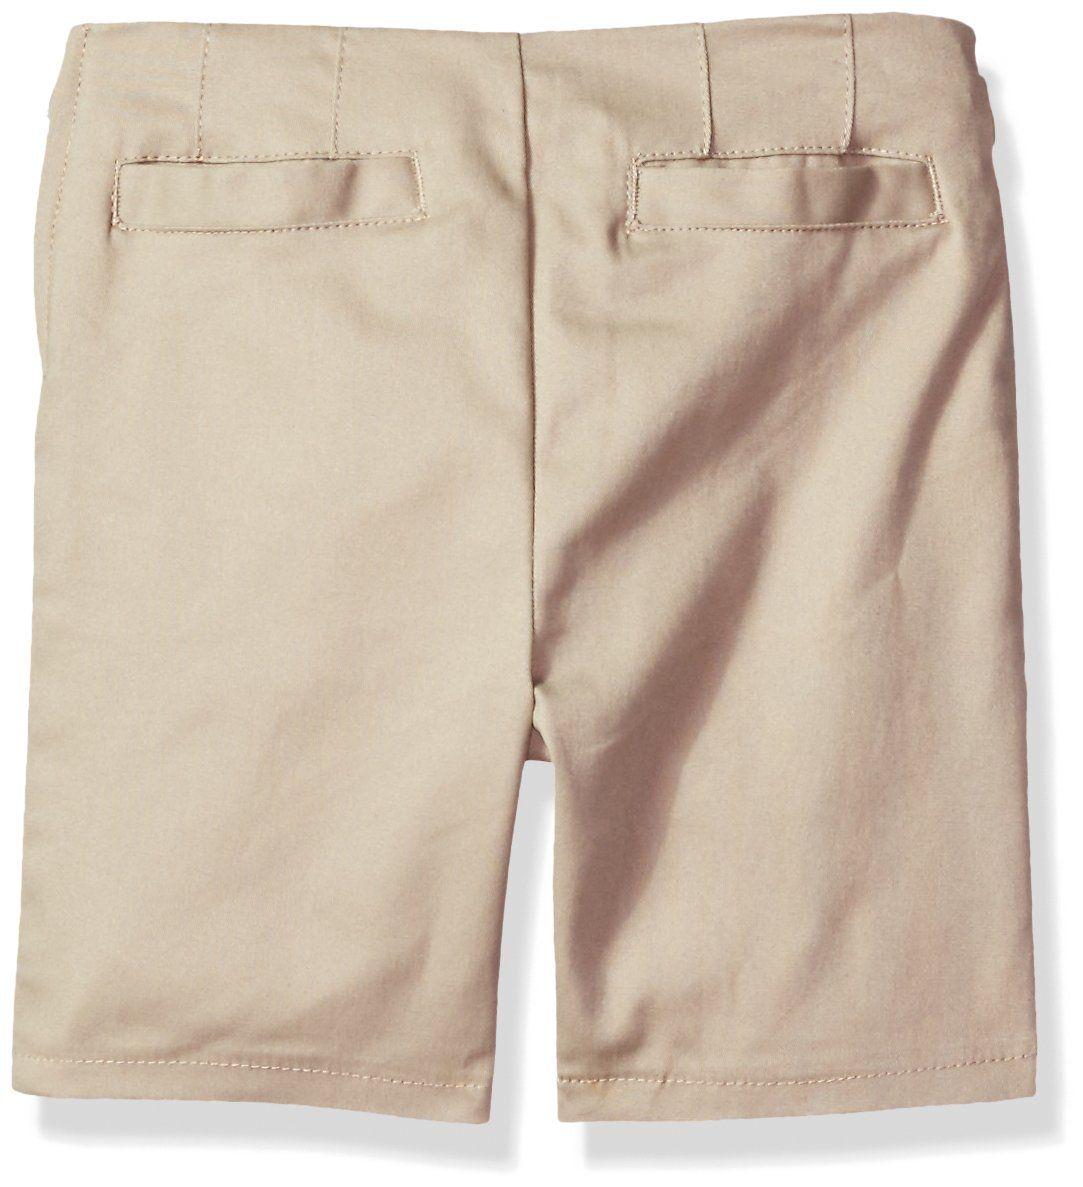 2714 Magenta Limited Too Big Girls Stretch Twill 5 Pocket Short